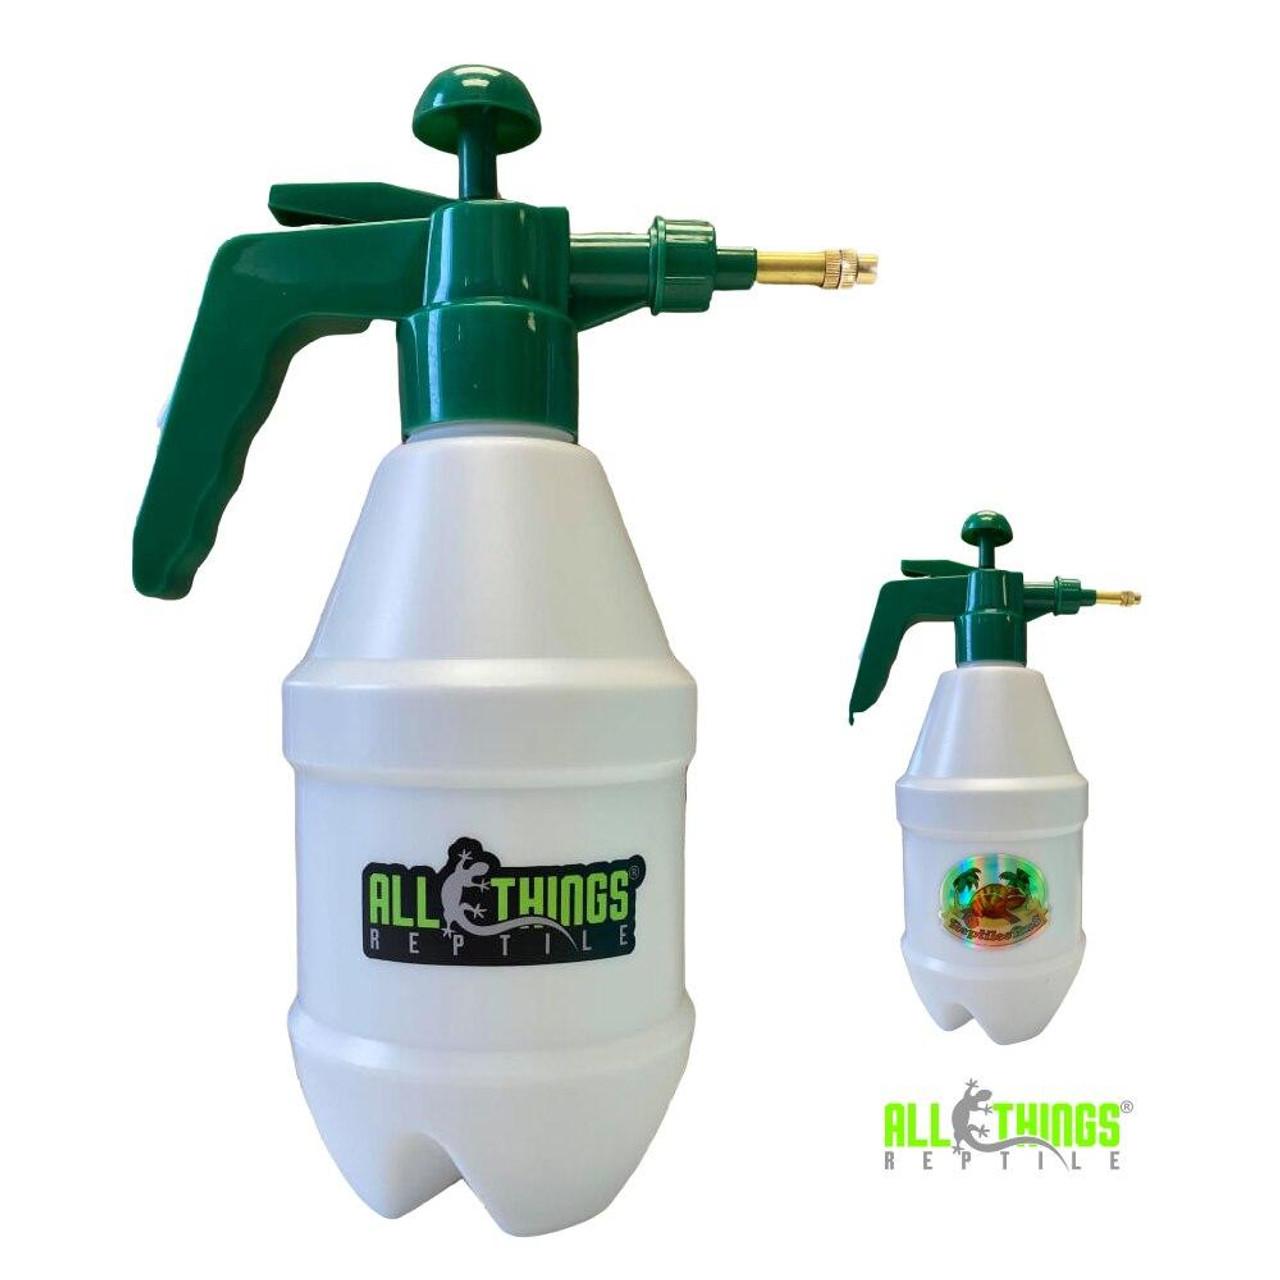 All Things Reptile ATR High Quality Pressure Sprayer 1L